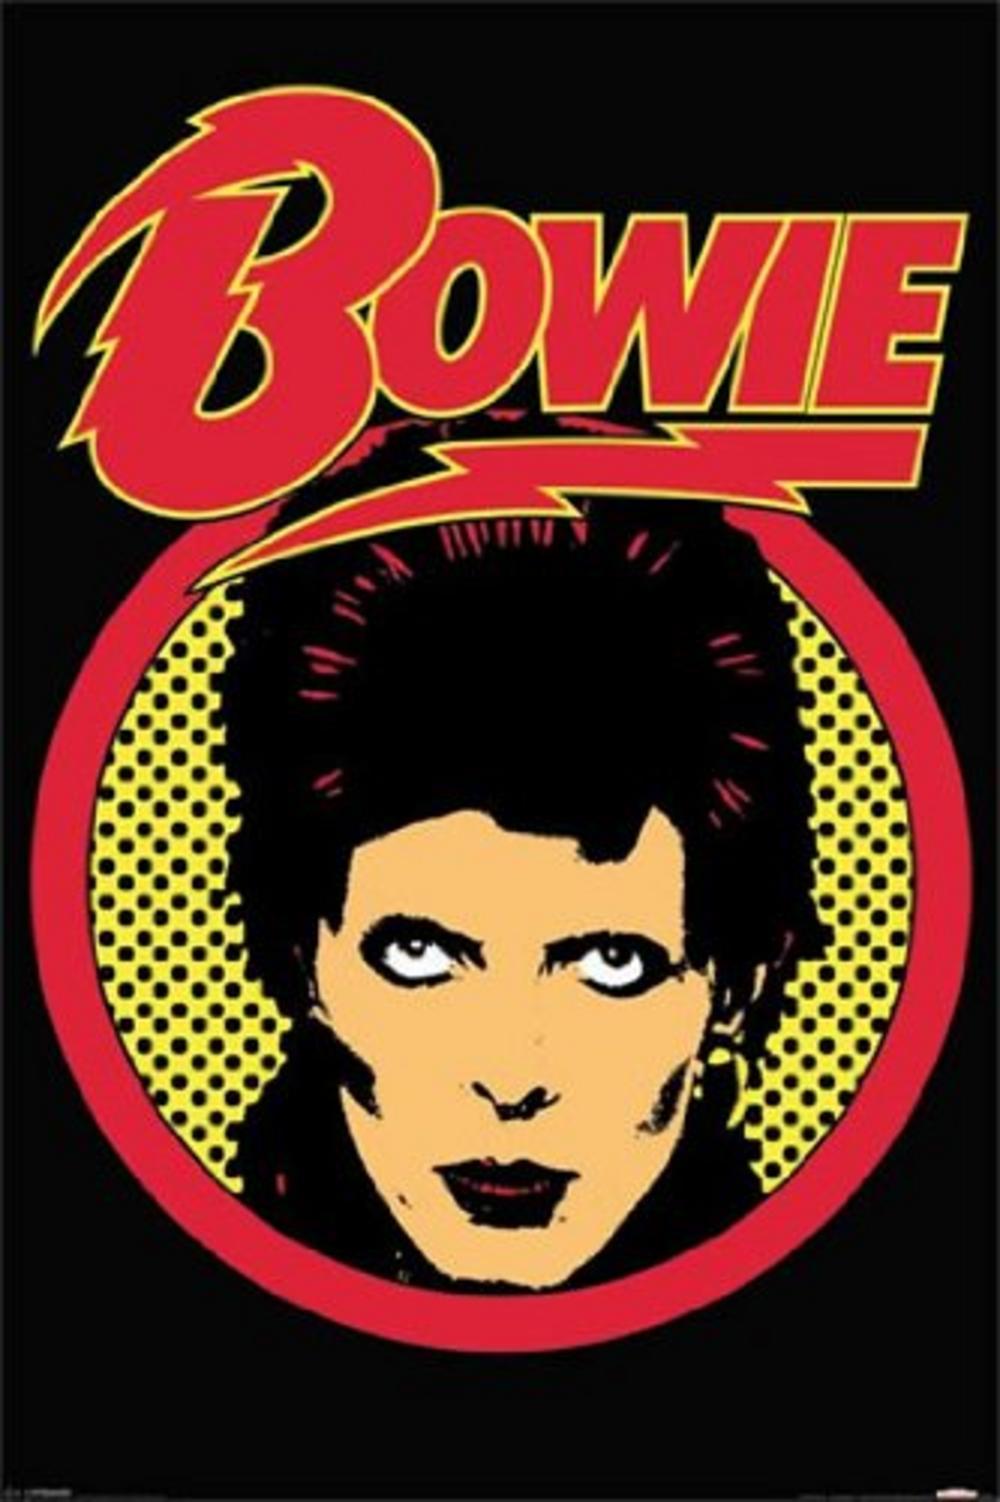 David Bowie – Wikipedia